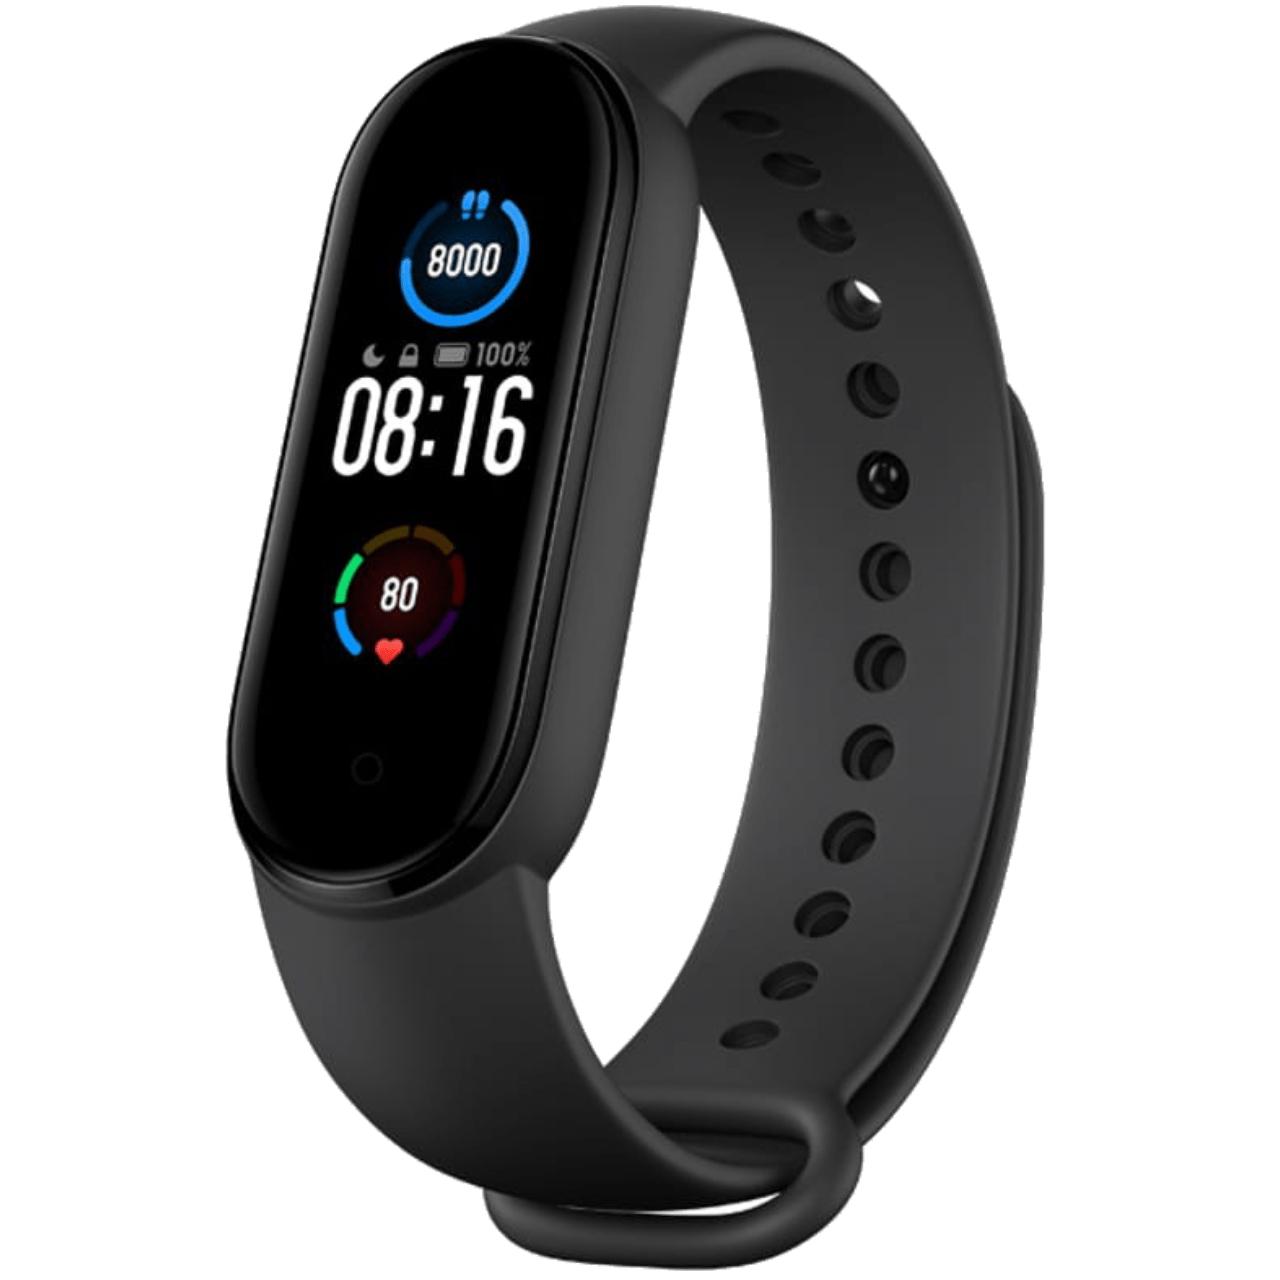 "Xiaomi Mi Band 5: Fitness Tracker (1.1"" Amoled Display, 24/7 Heart Rate Sensor, 11 Sport Mode, BT5.0) £21.16 @ Xiaomi MC Store / AliExpress"